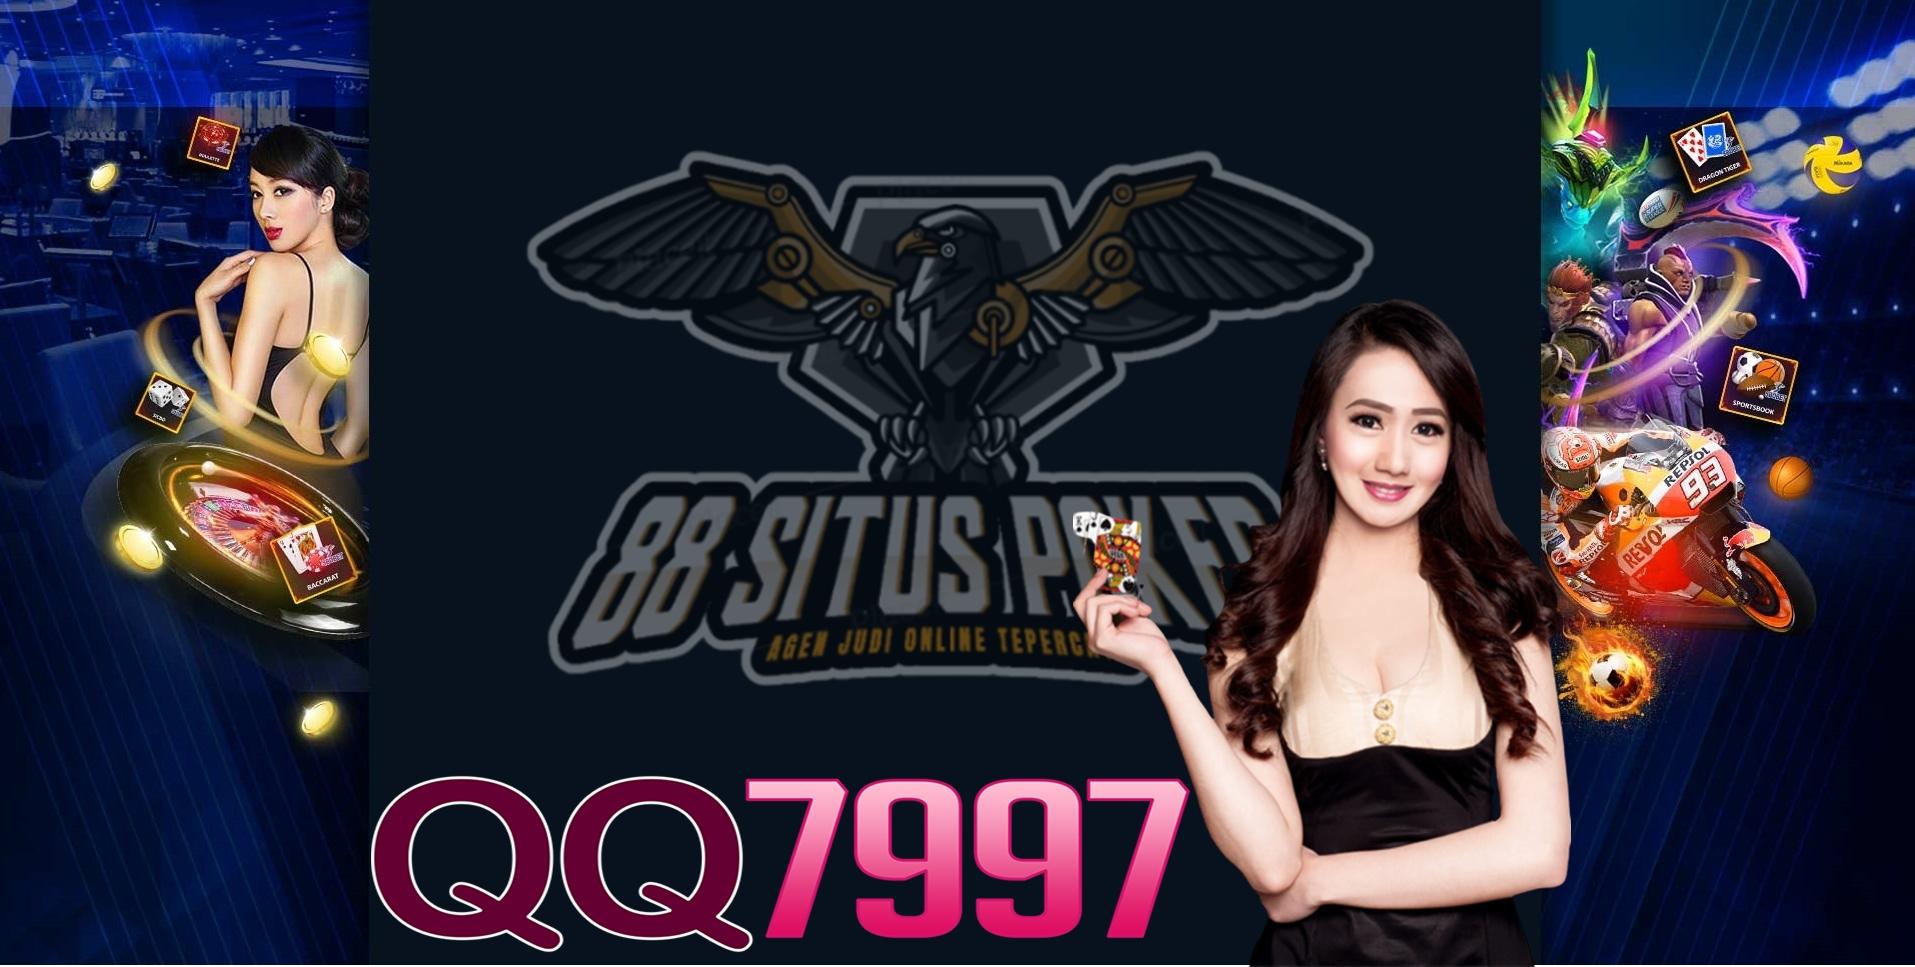 Qq Slot Terbaru 2020, Agen Judi Slot Terpercaya Indonesia - QQ7997